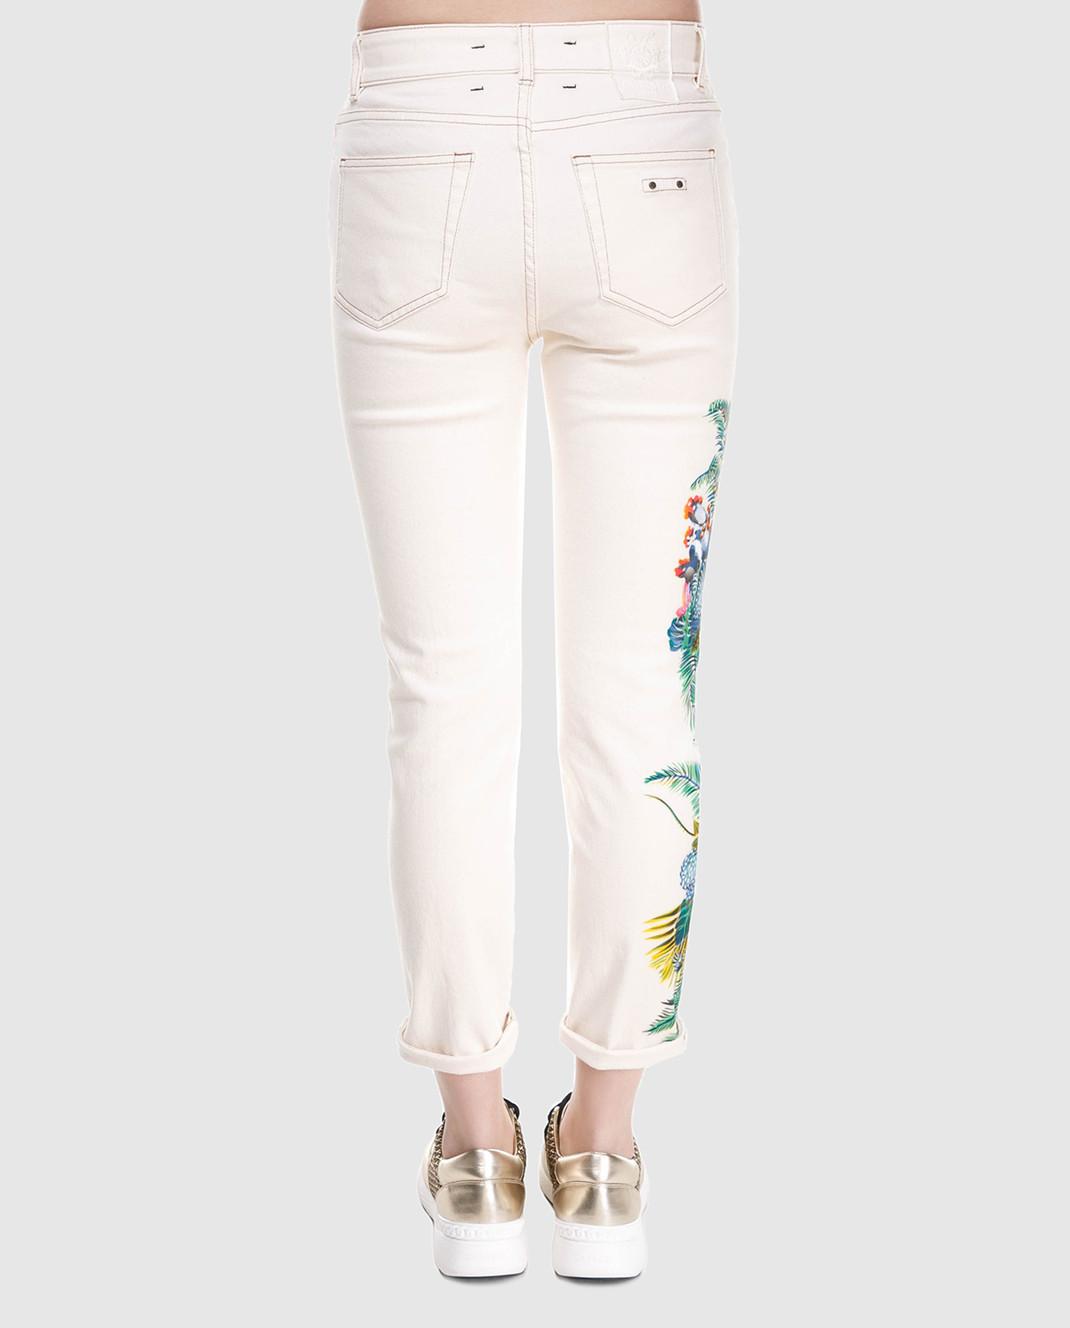 Mr&Mrs Italy Белые джинсы JE091E изображение 4